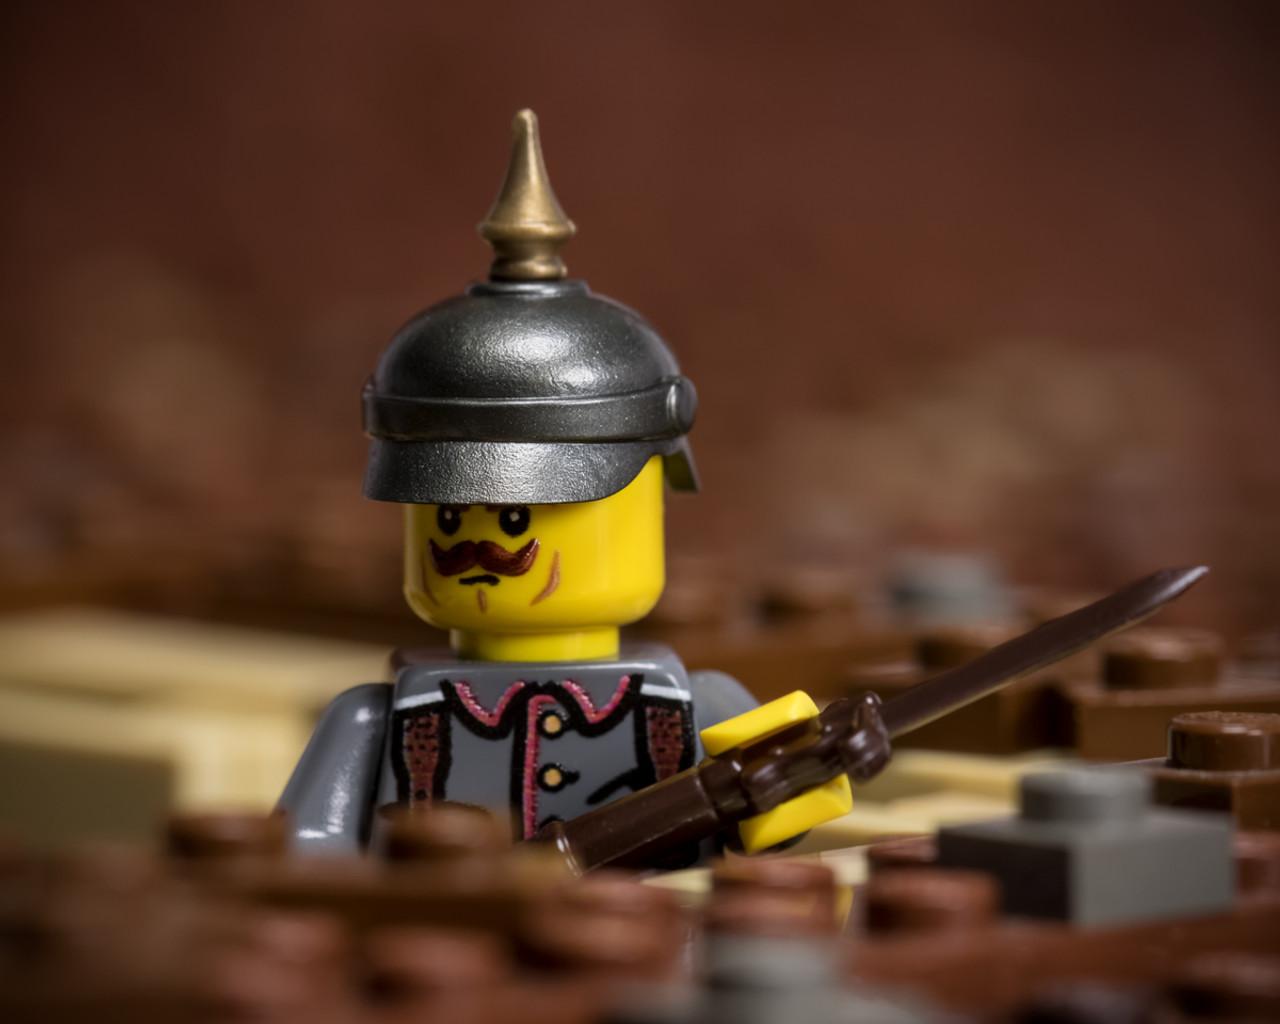 BrickArms Pickelhaube Helmet